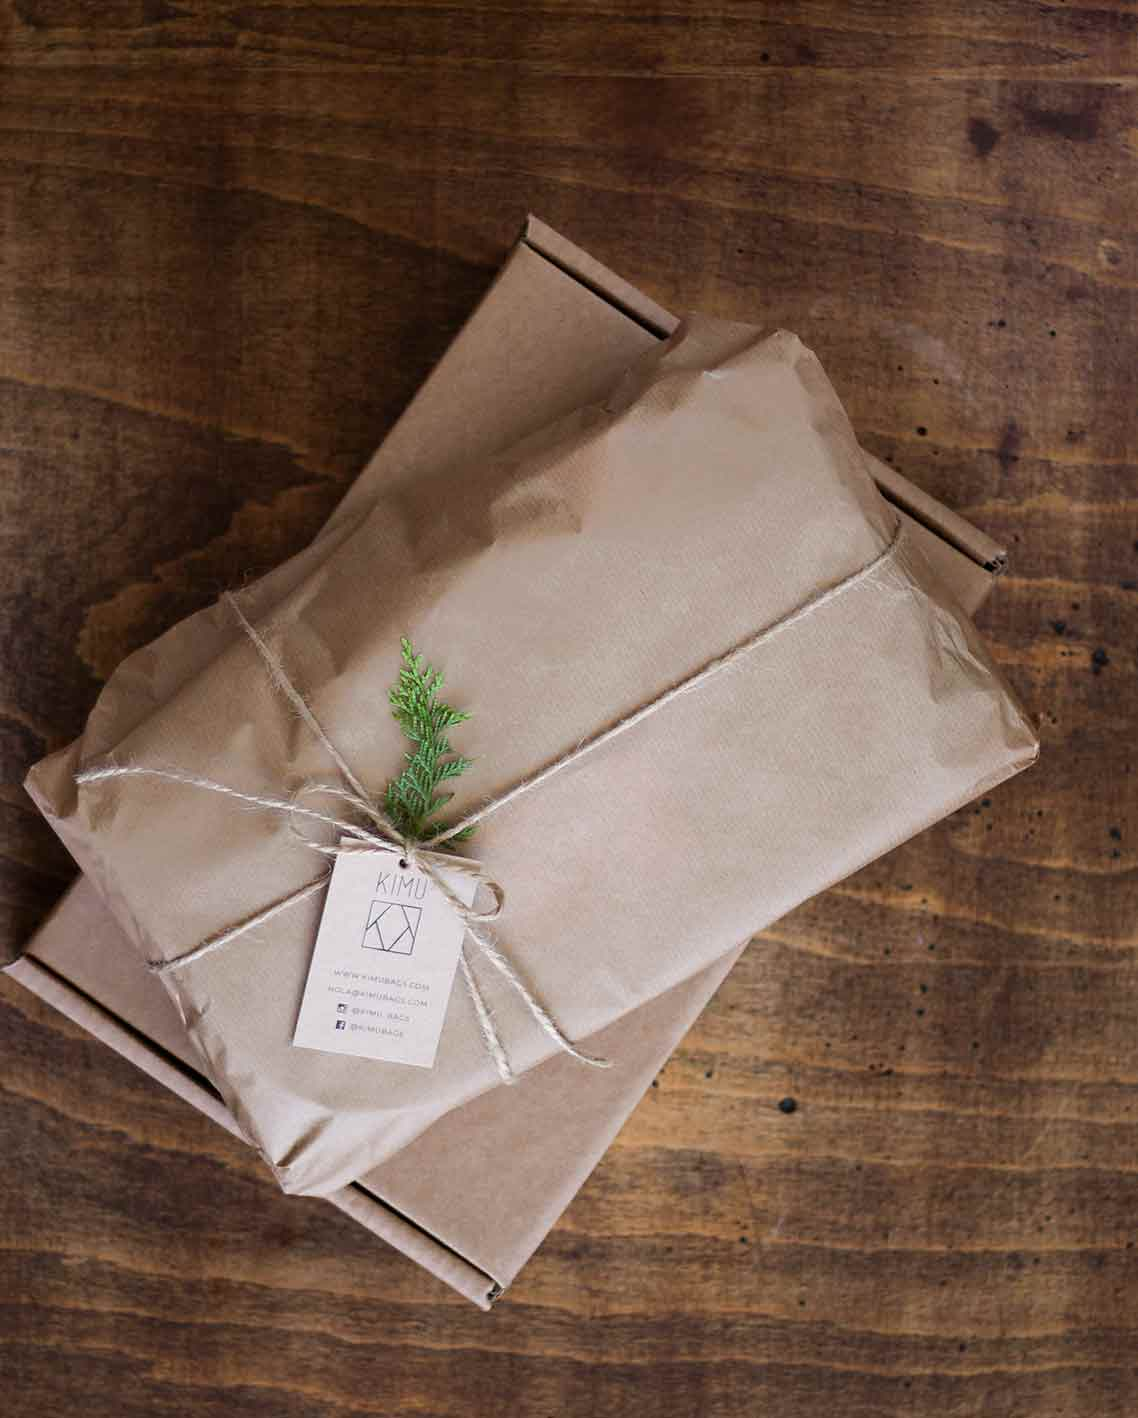 packaging-kimu